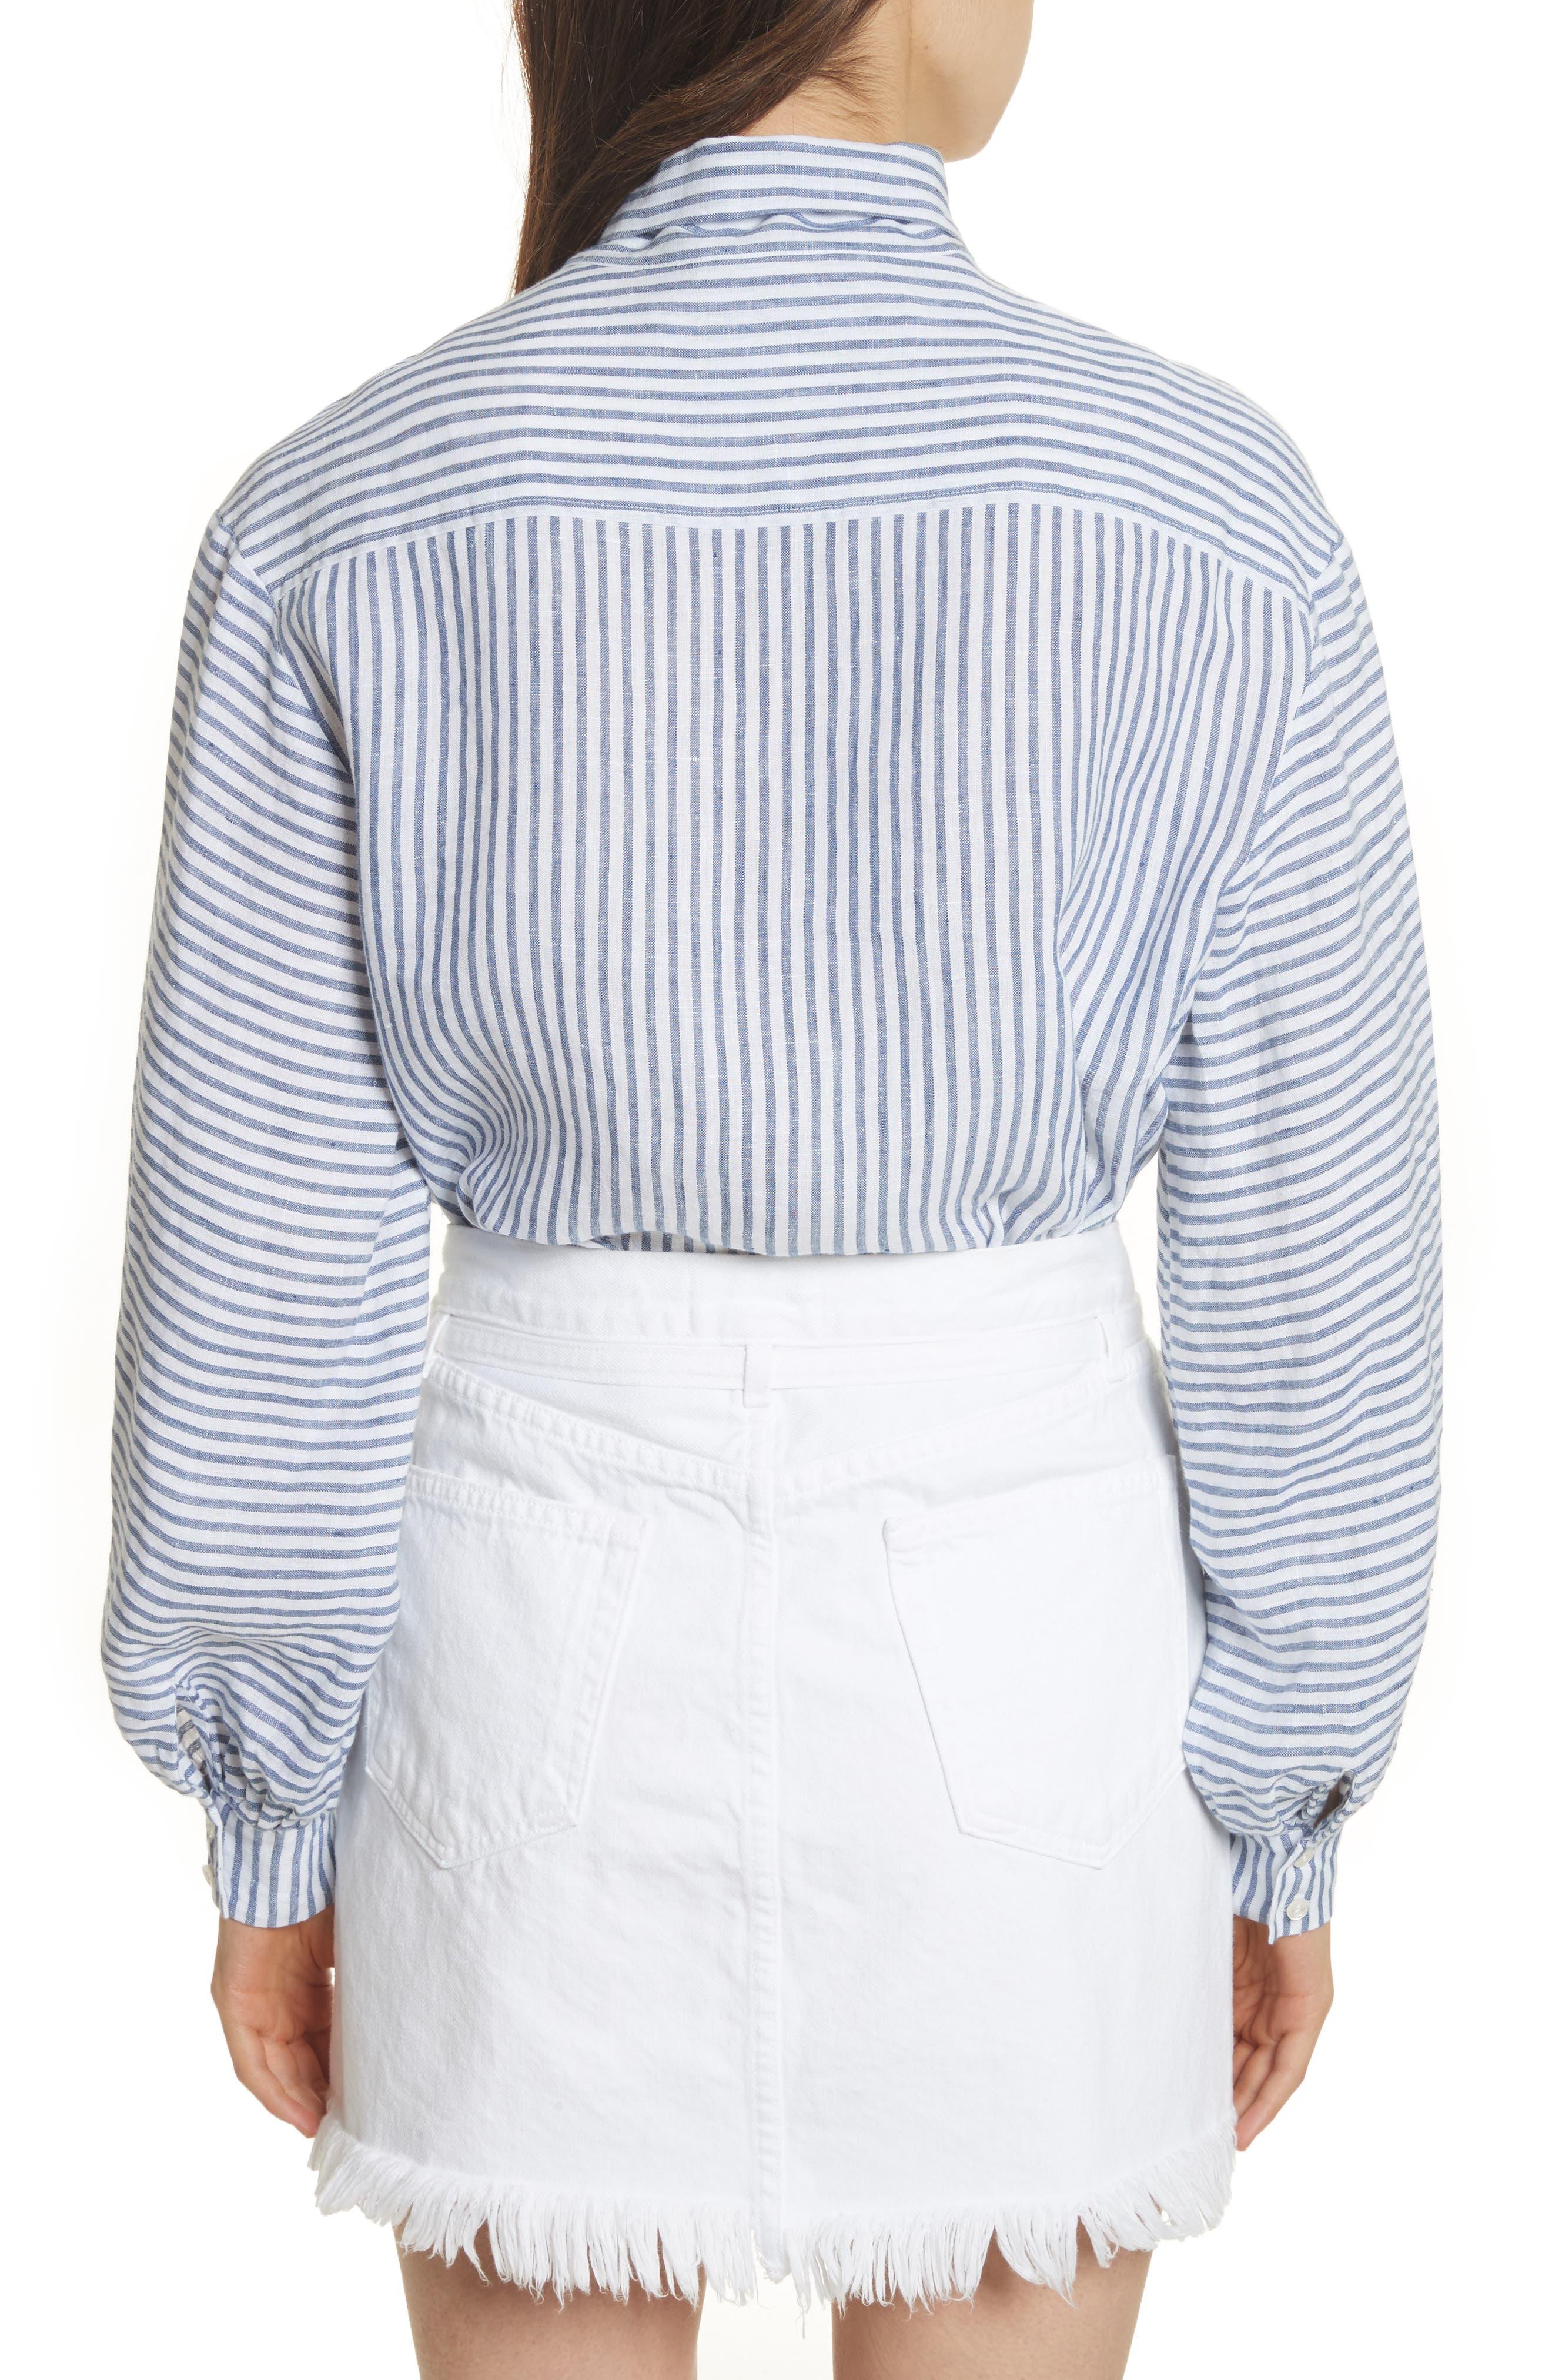 Stripe Handkerchief Blouse,                             Alternate thumbnail 2, color,                             401